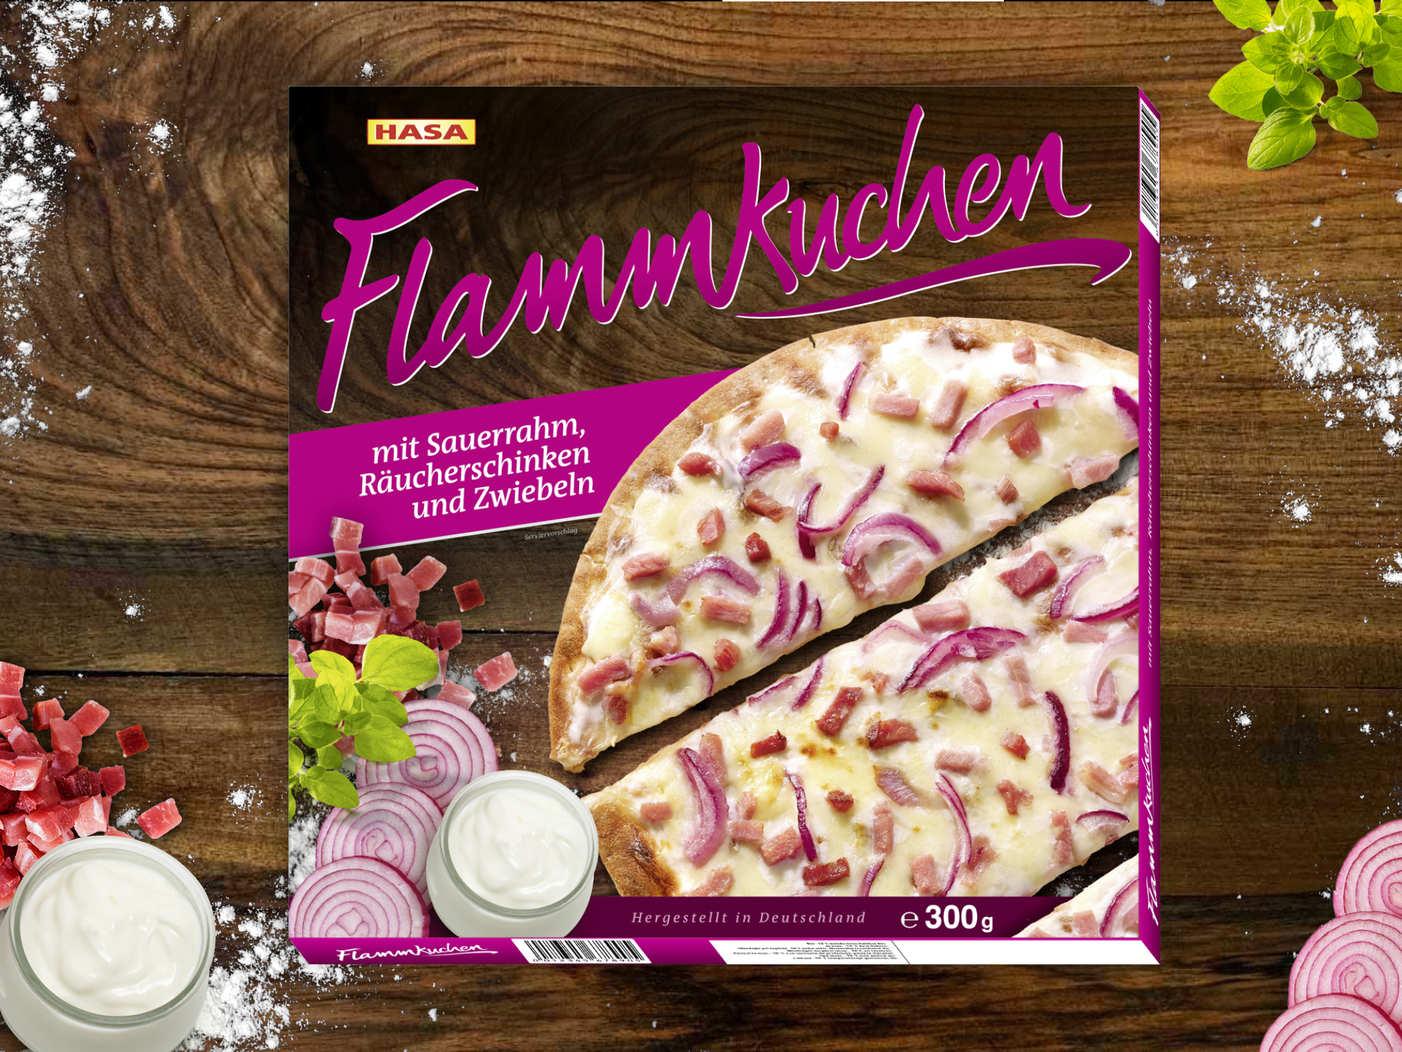 HASA-15-0162-Flammkuchen_WebRef_1920x1440